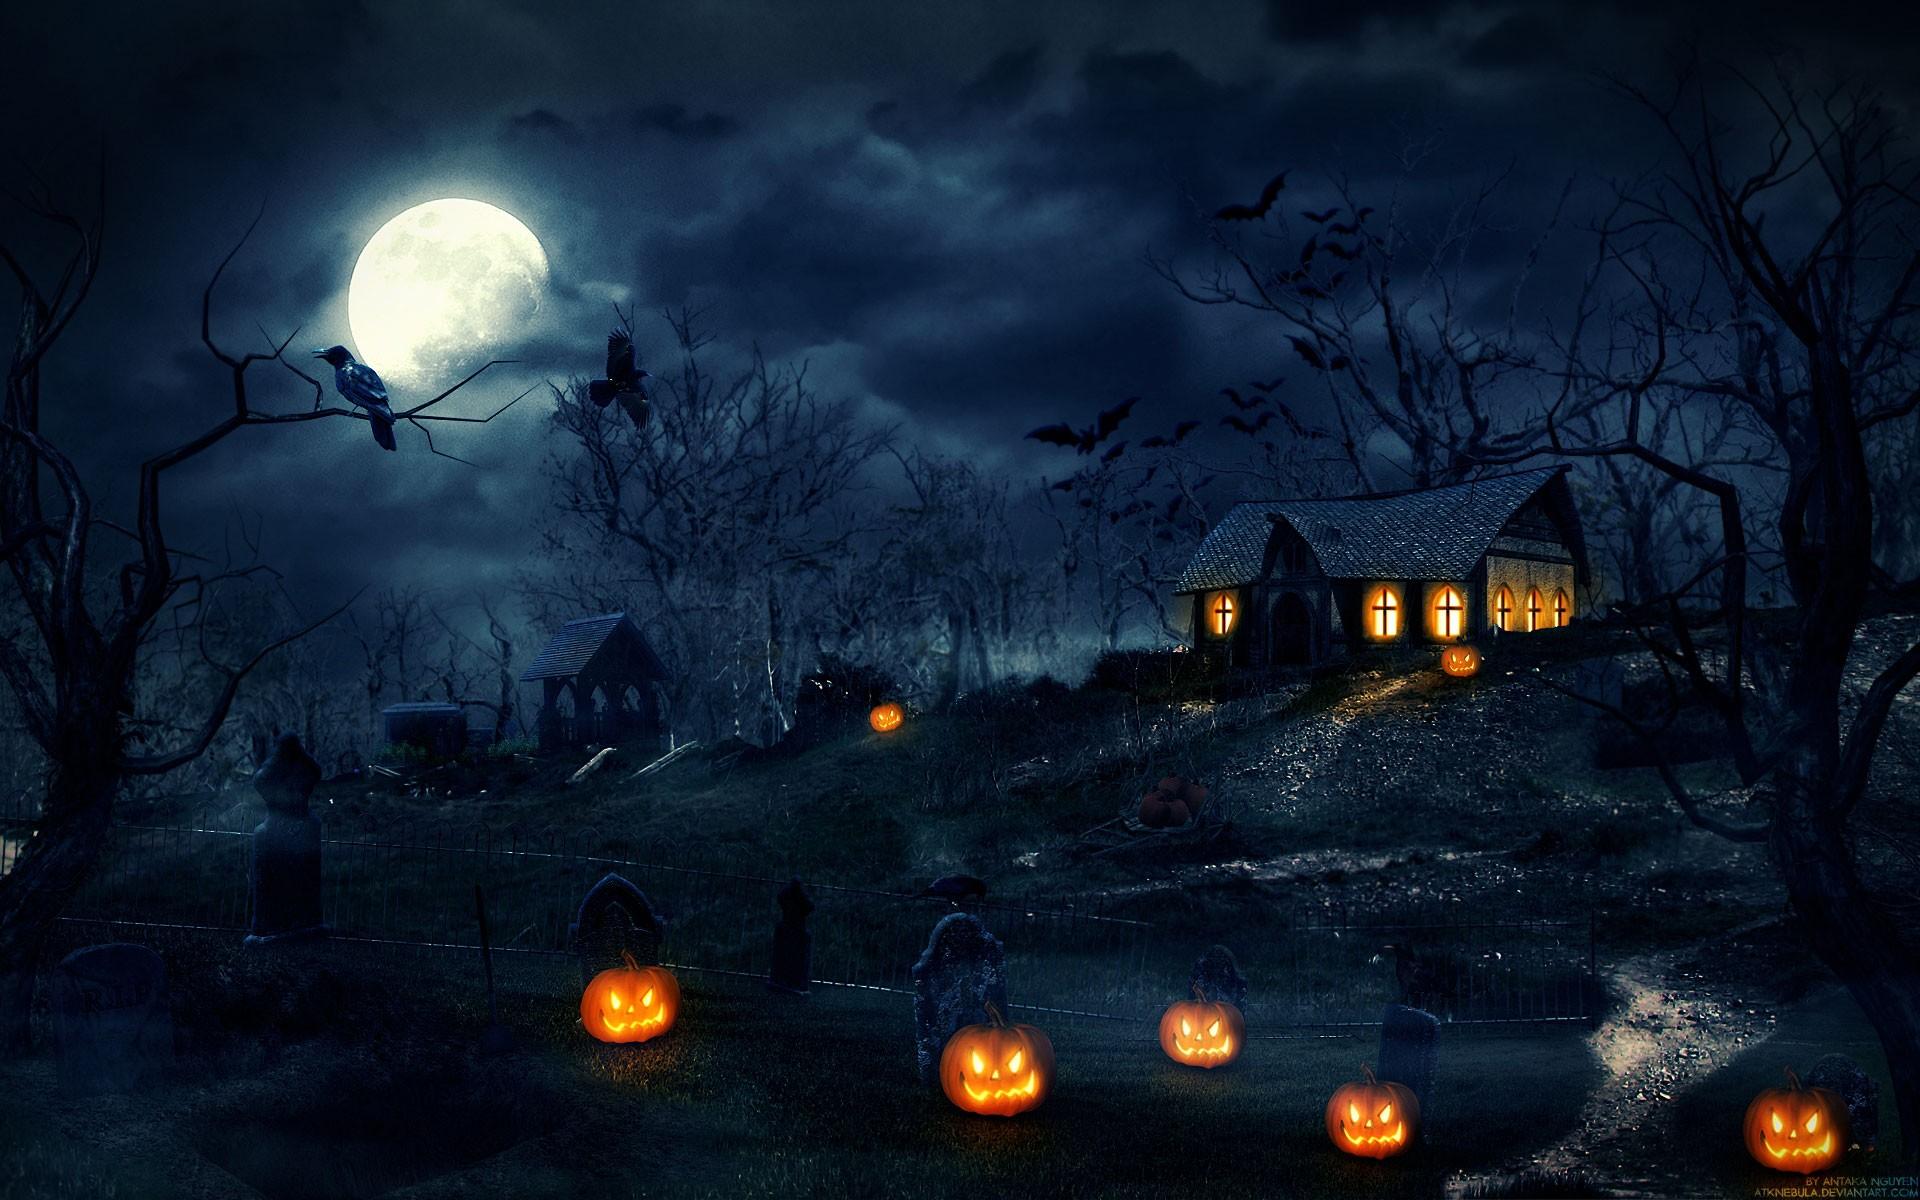 Happy Halloween Pumpkins Wallpaper HD Cool Images Download Tablet 1920x1200